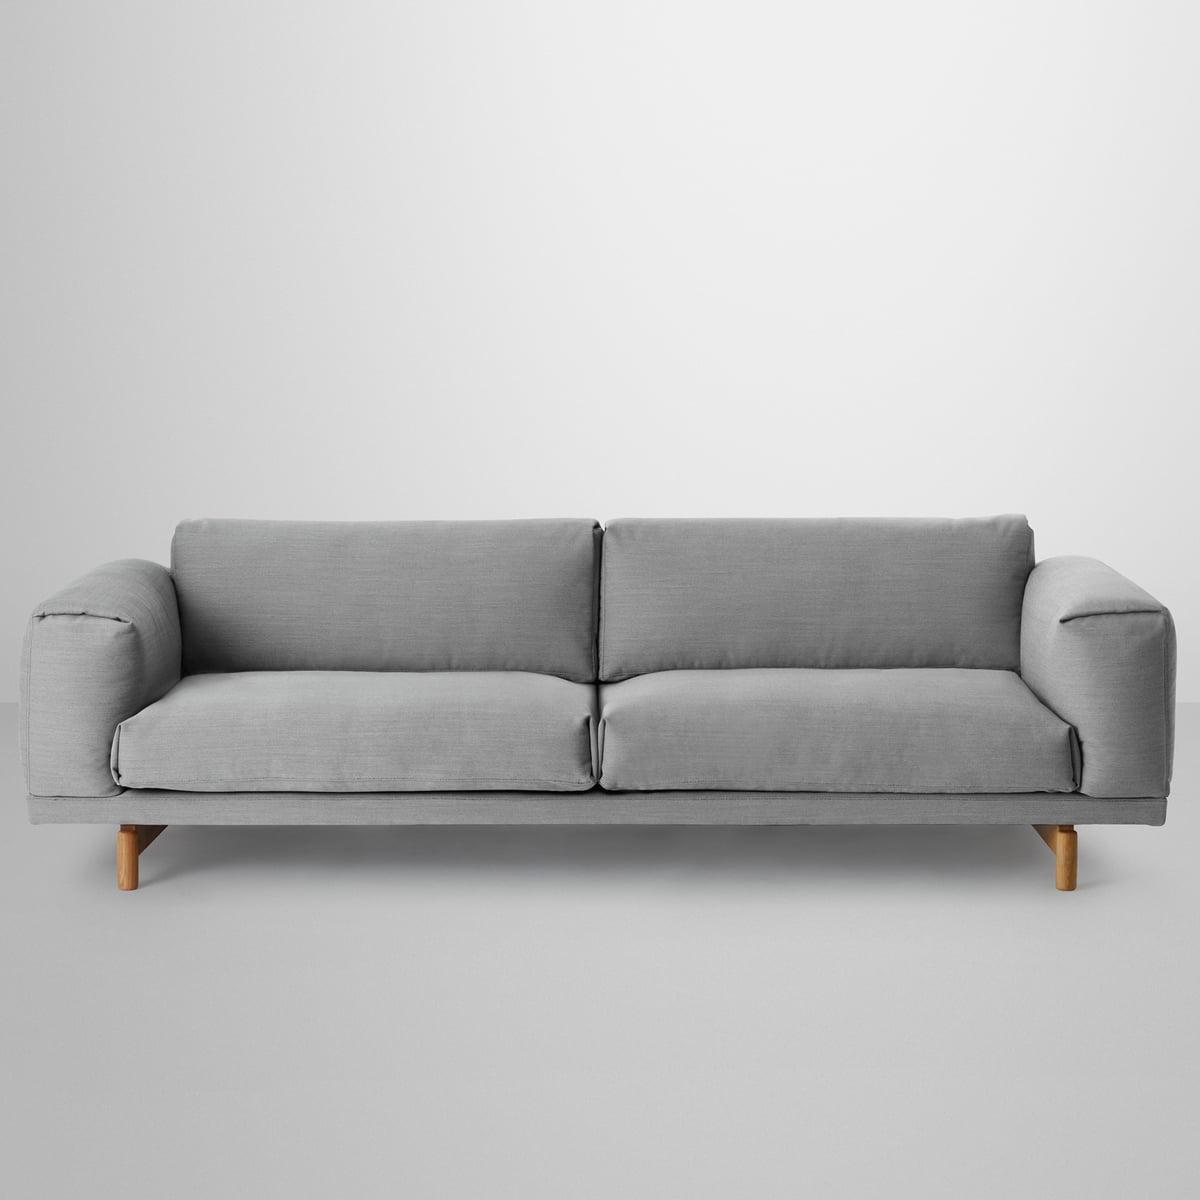 Full Size of Muuto Sofa Furniture Uk Sofabord Airy Eg Outline Oslo Rest Review Dba 2 Seater Chaise Longue 3 Large Compose Sale Baxter Led Modernes Bora Günstig Ikea Mit Sofa Muuto Sofa